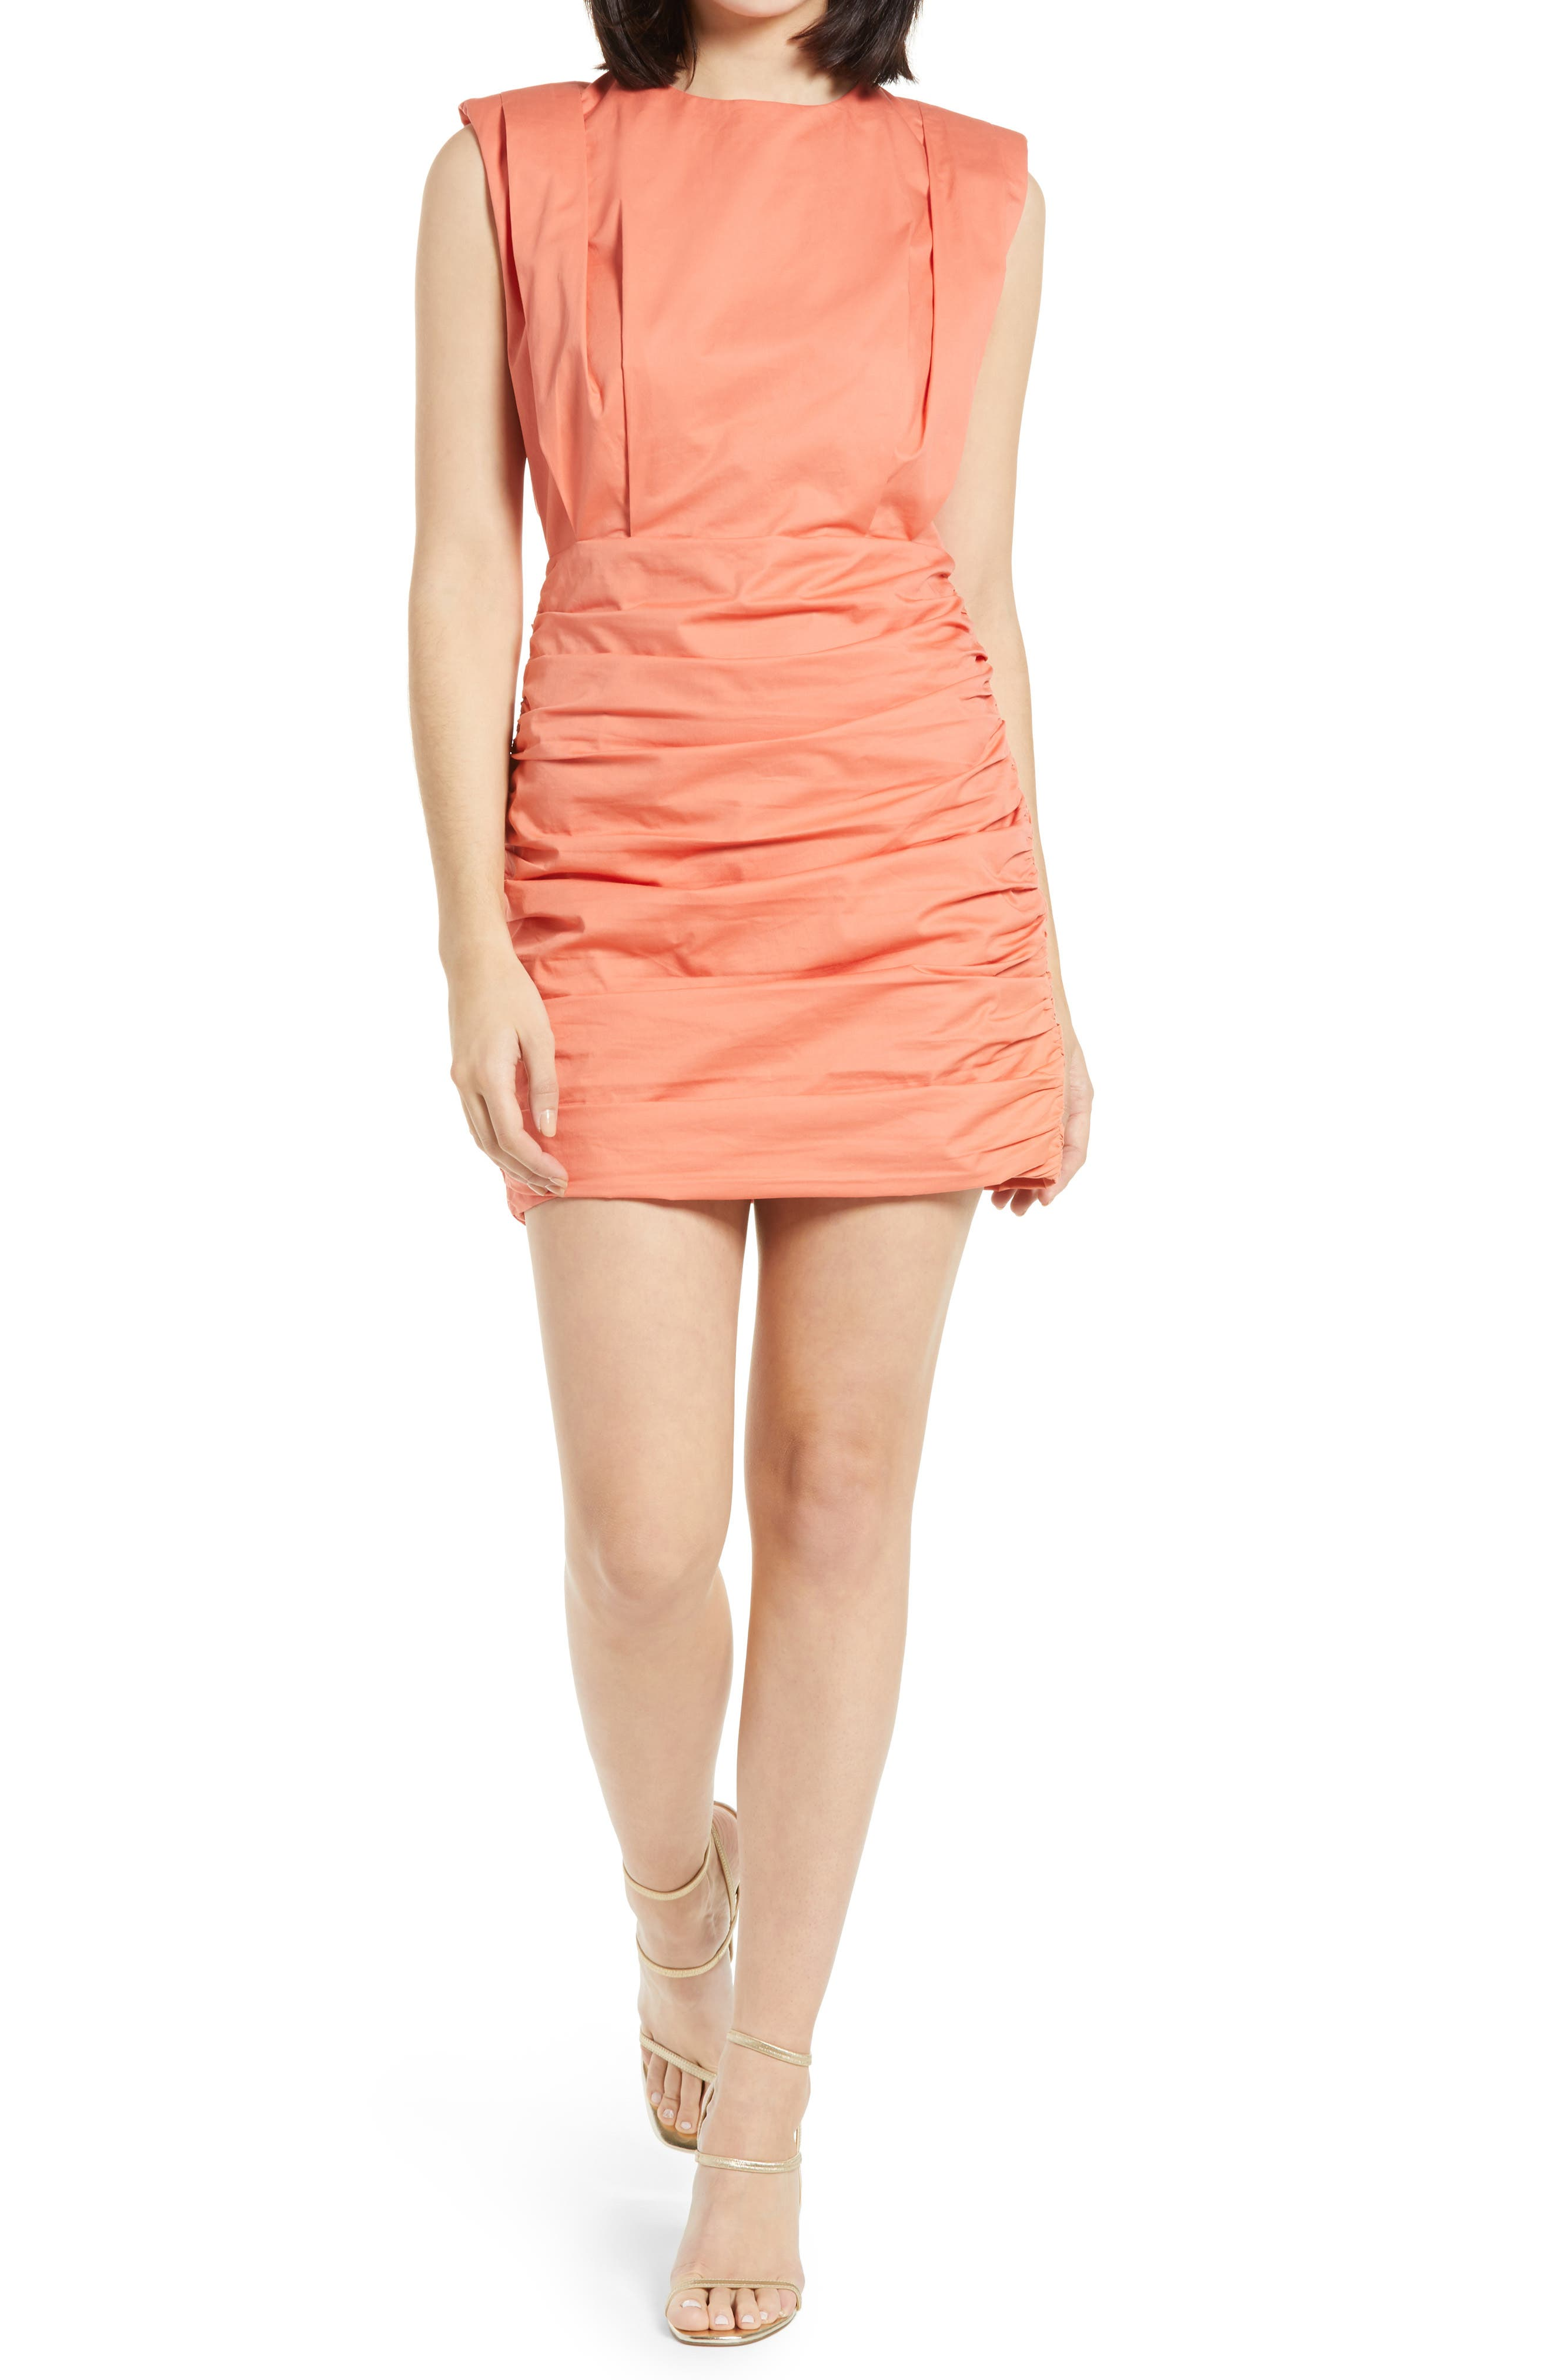 Pleated Shoulder Pad Dress